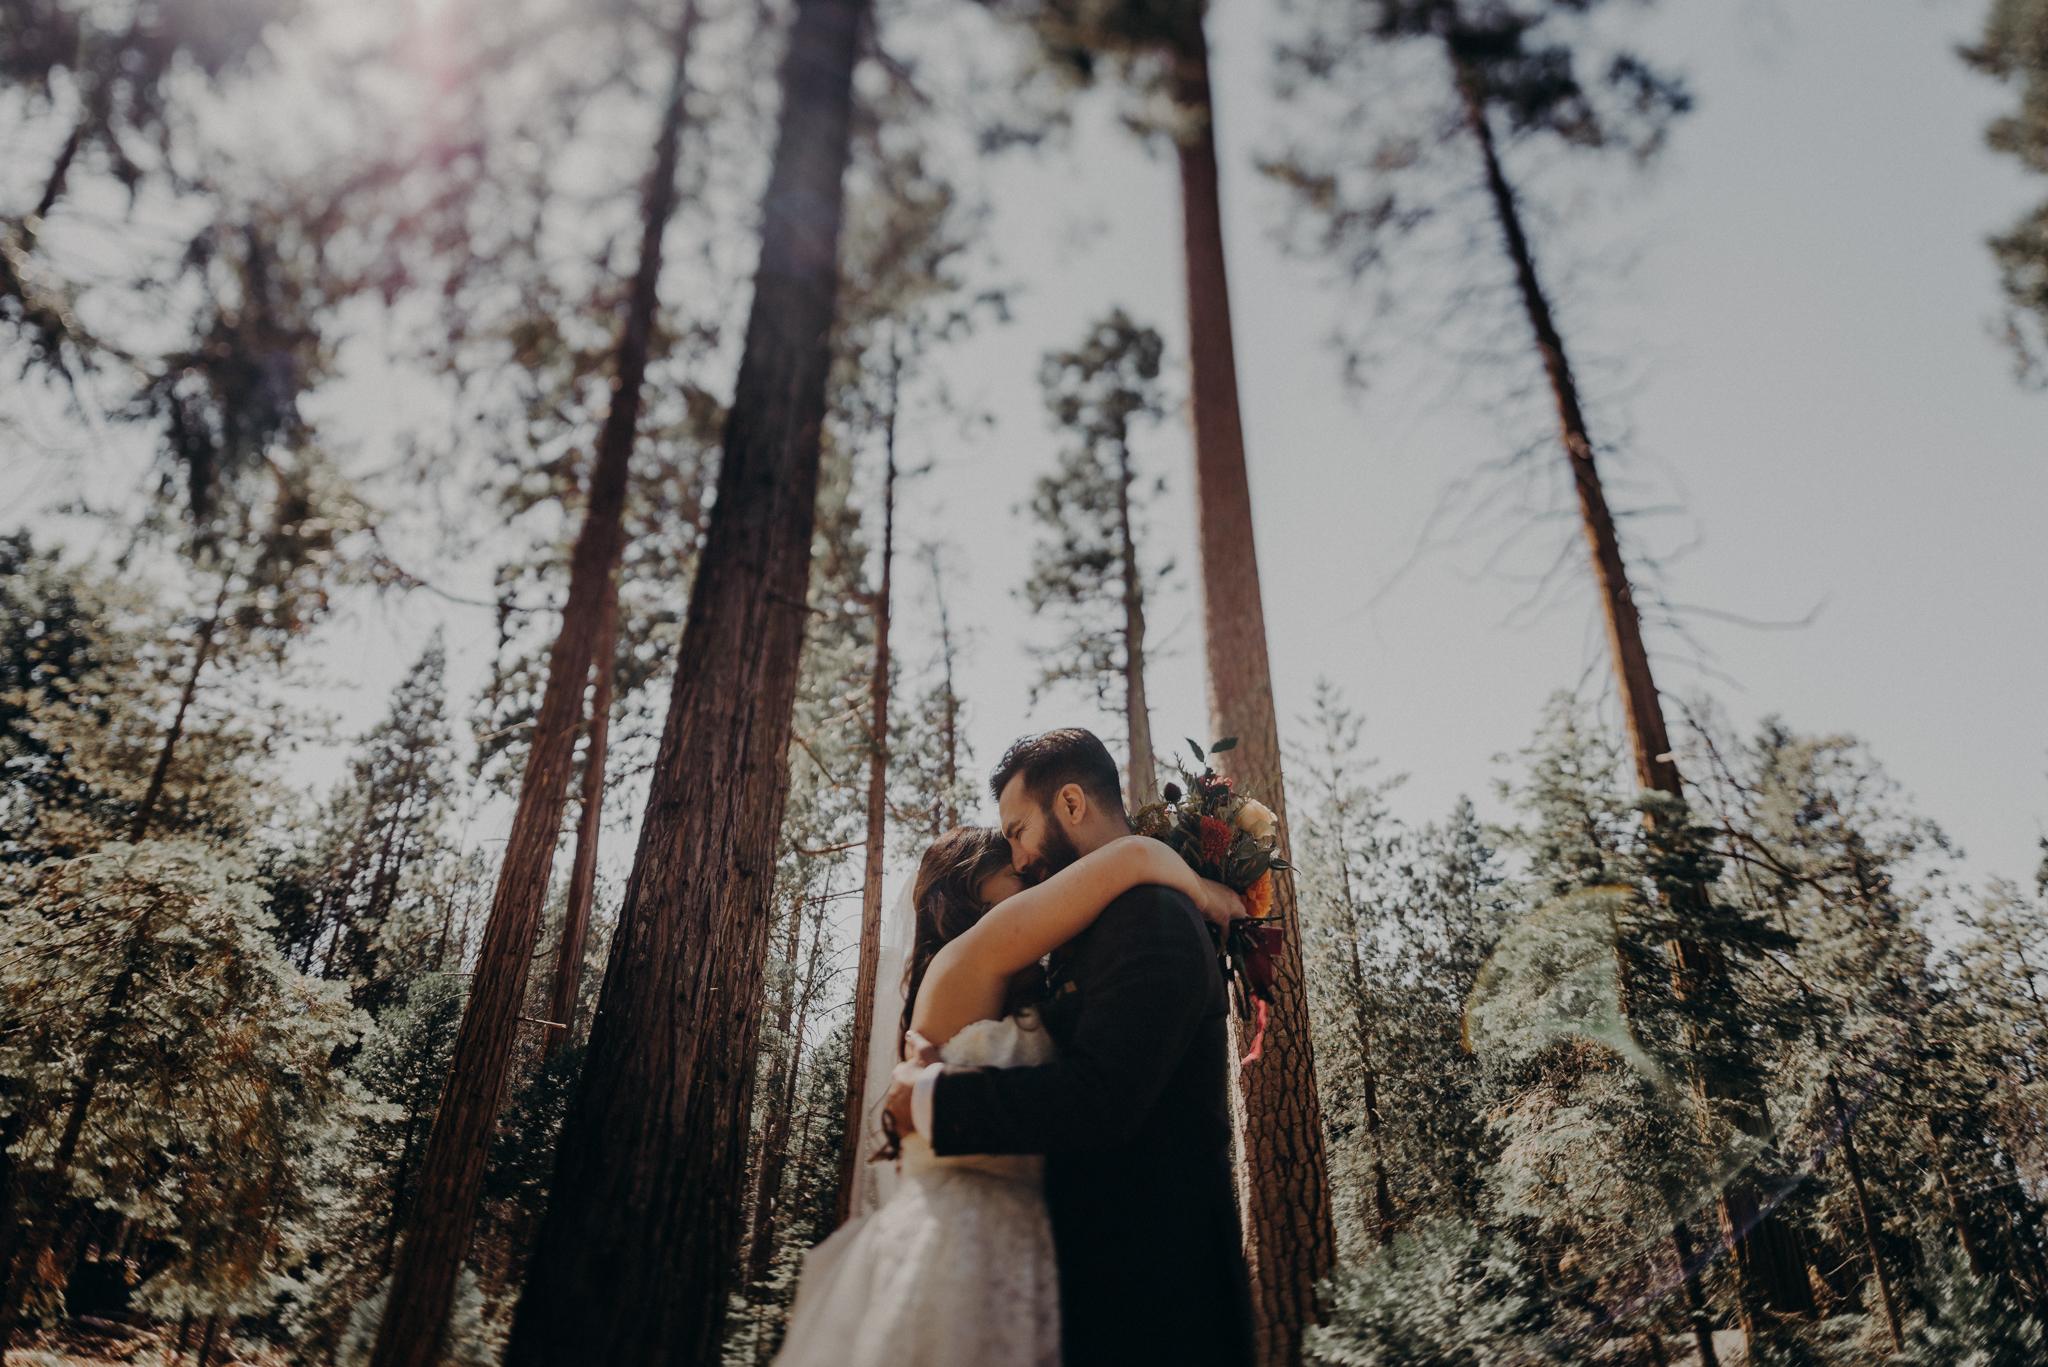 Yosemite Elopement Photographer - Evergreen Lodge Wedding Photographer - IsaiahAndTaylor.com-077.jpg